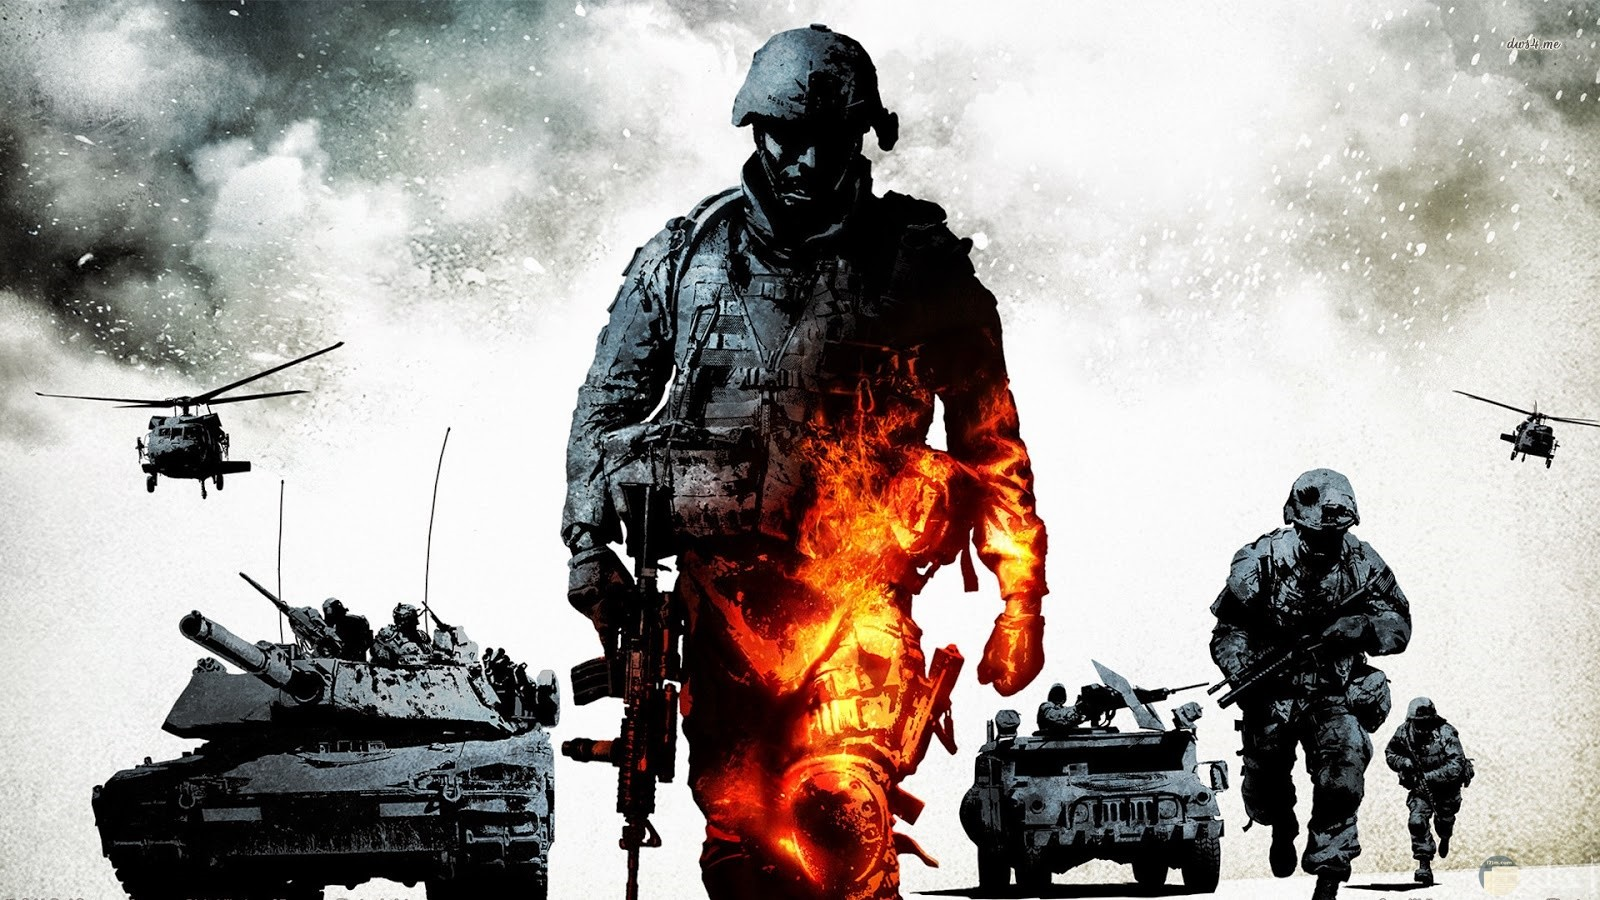 رجل جندي يرتدي خوزه وبيده بندقيه او رشاش ويرتدي لبس الجندي ويظهر علي رجله اليسري شئ يشبه النيران وورائه مدرعه وطيارات وجنود